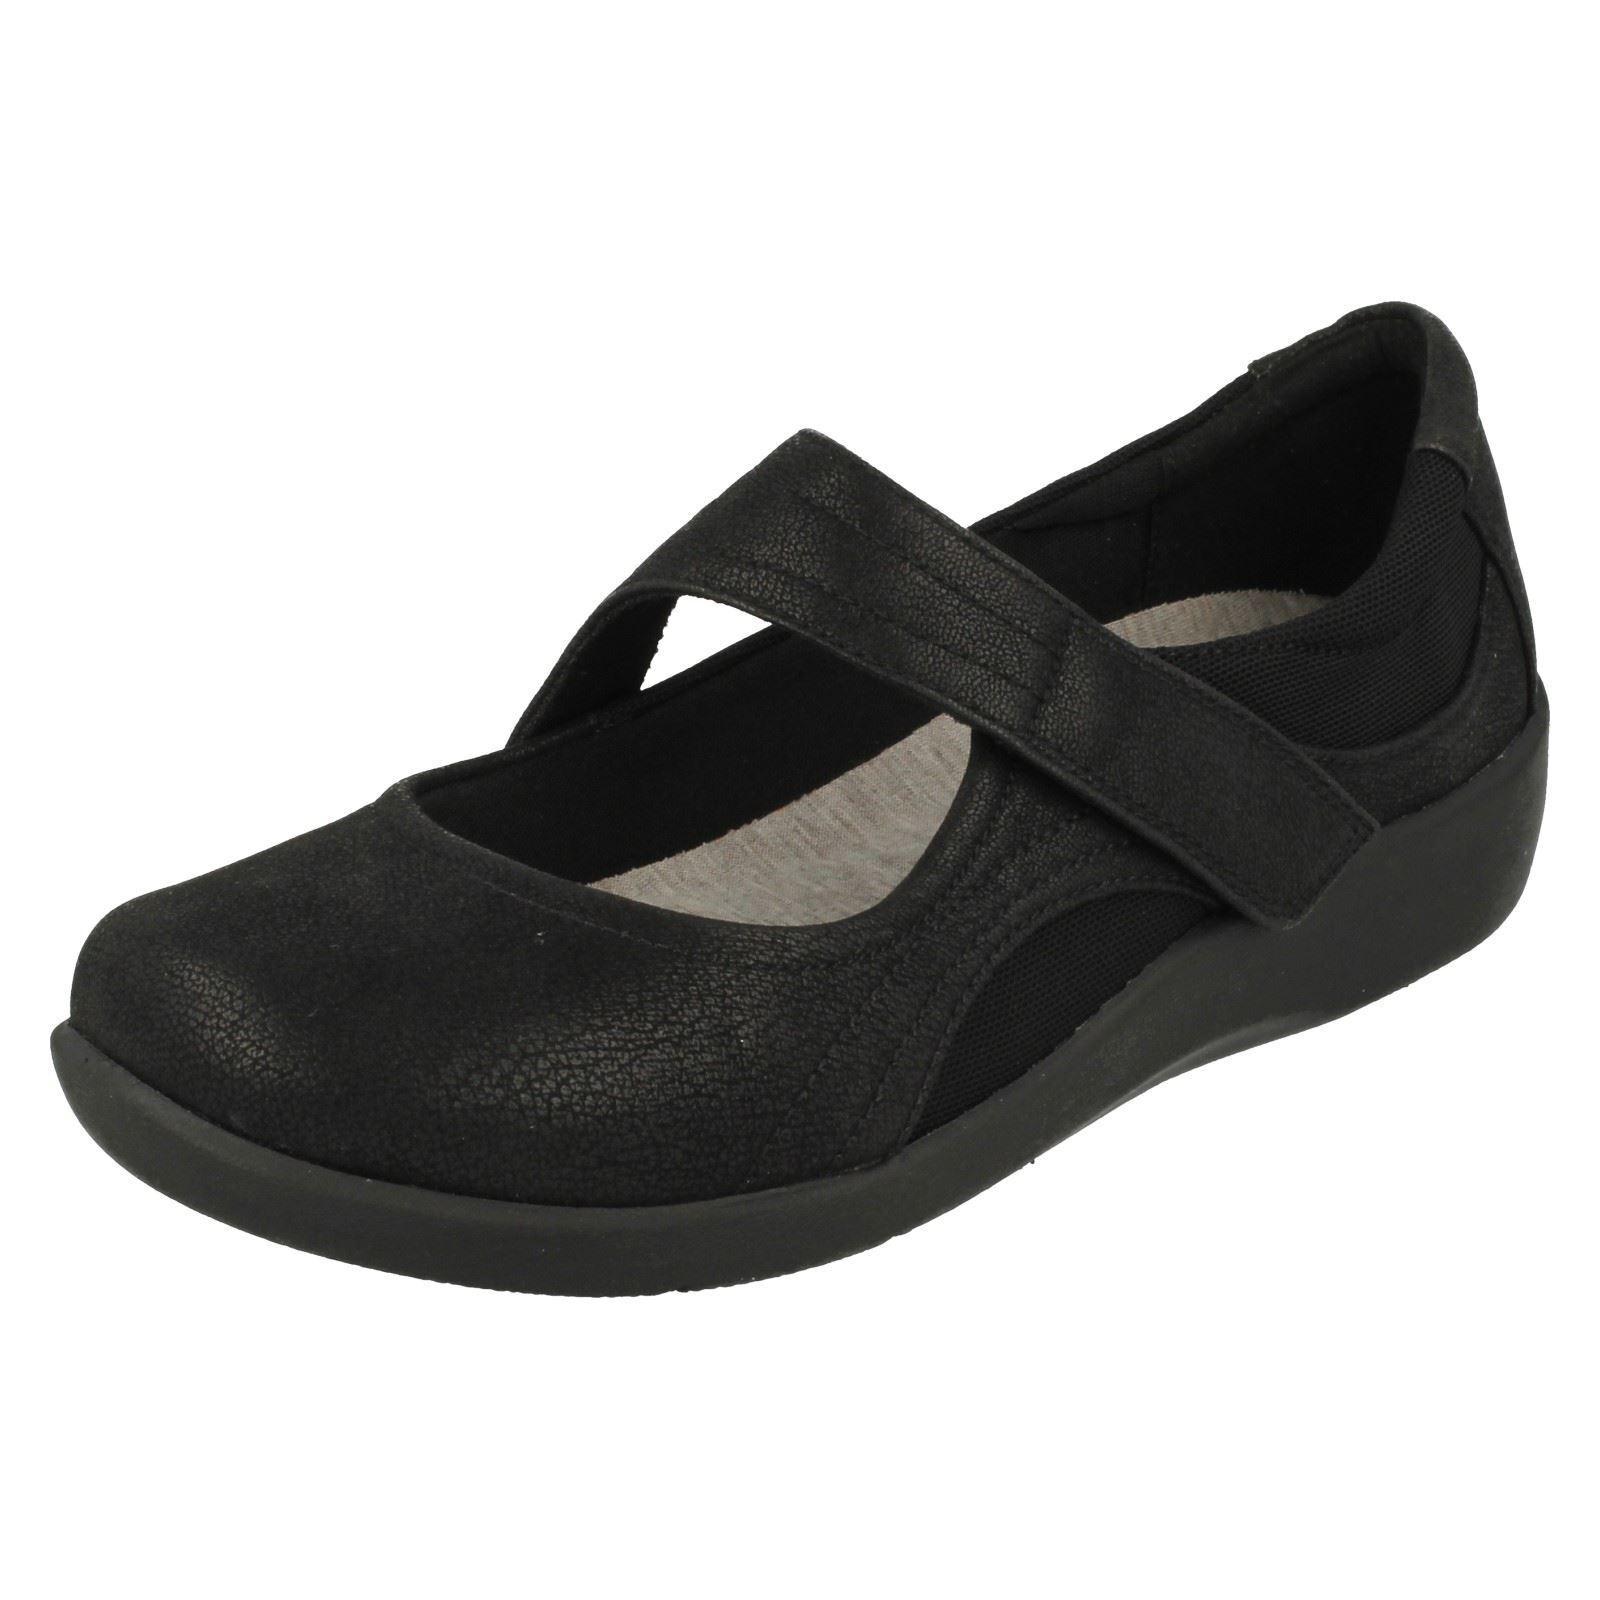 Damas Clarks Zapatos Informales cloudsteppers cloudsteppers cloudsteppers  Sillian Bella   nuevo sádico